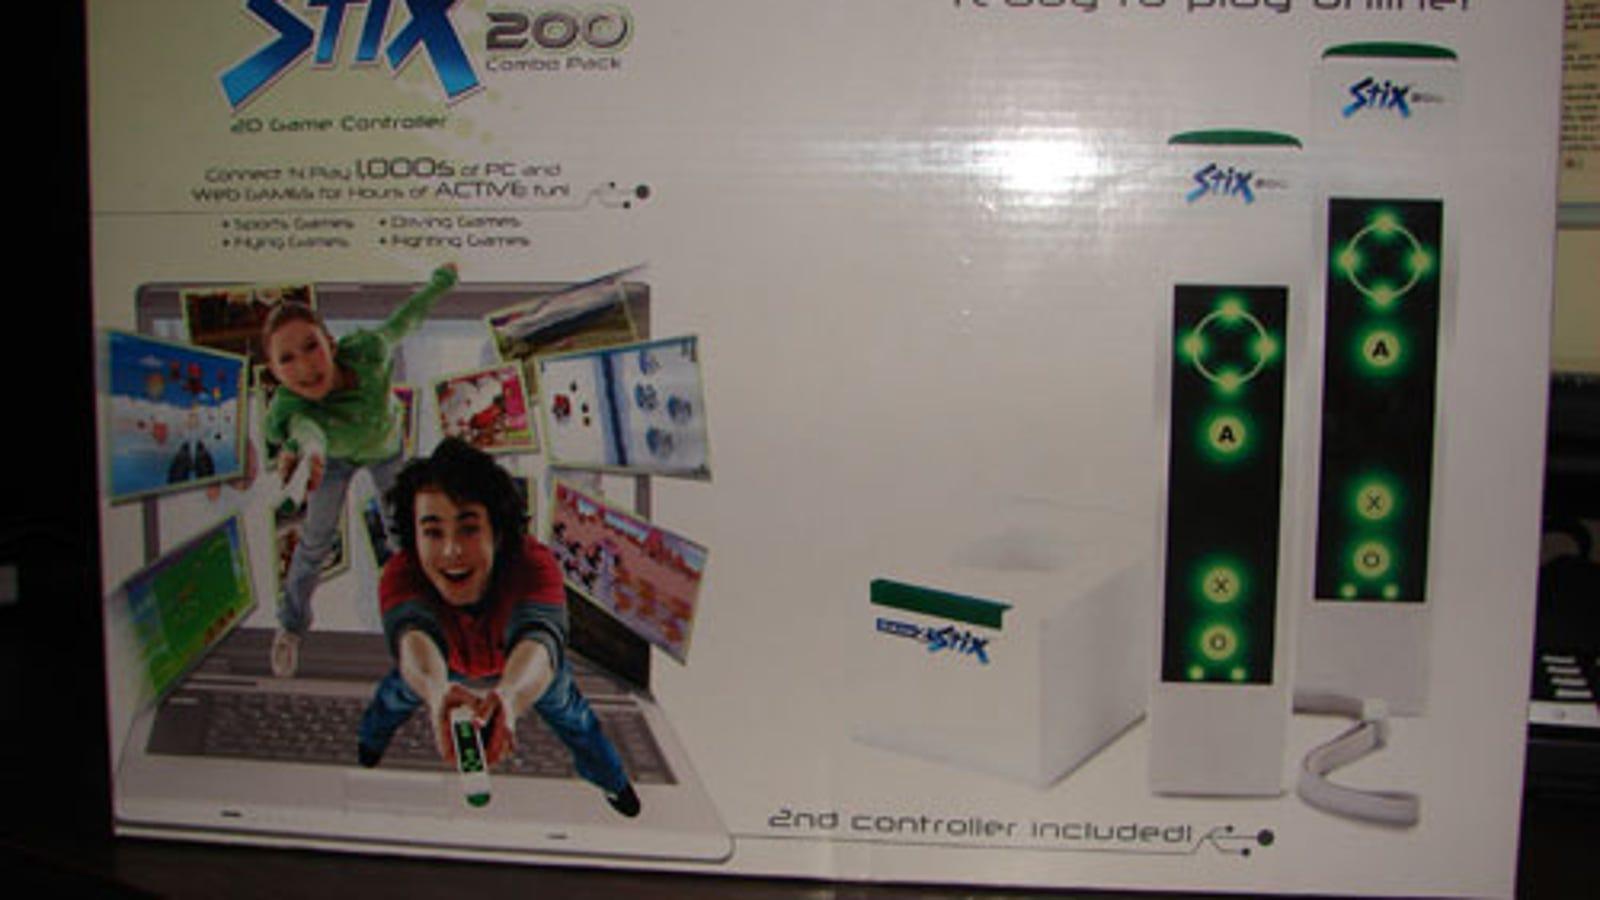 Stix200gpr 2. 4ghz wireless controller user manual playhut inc.